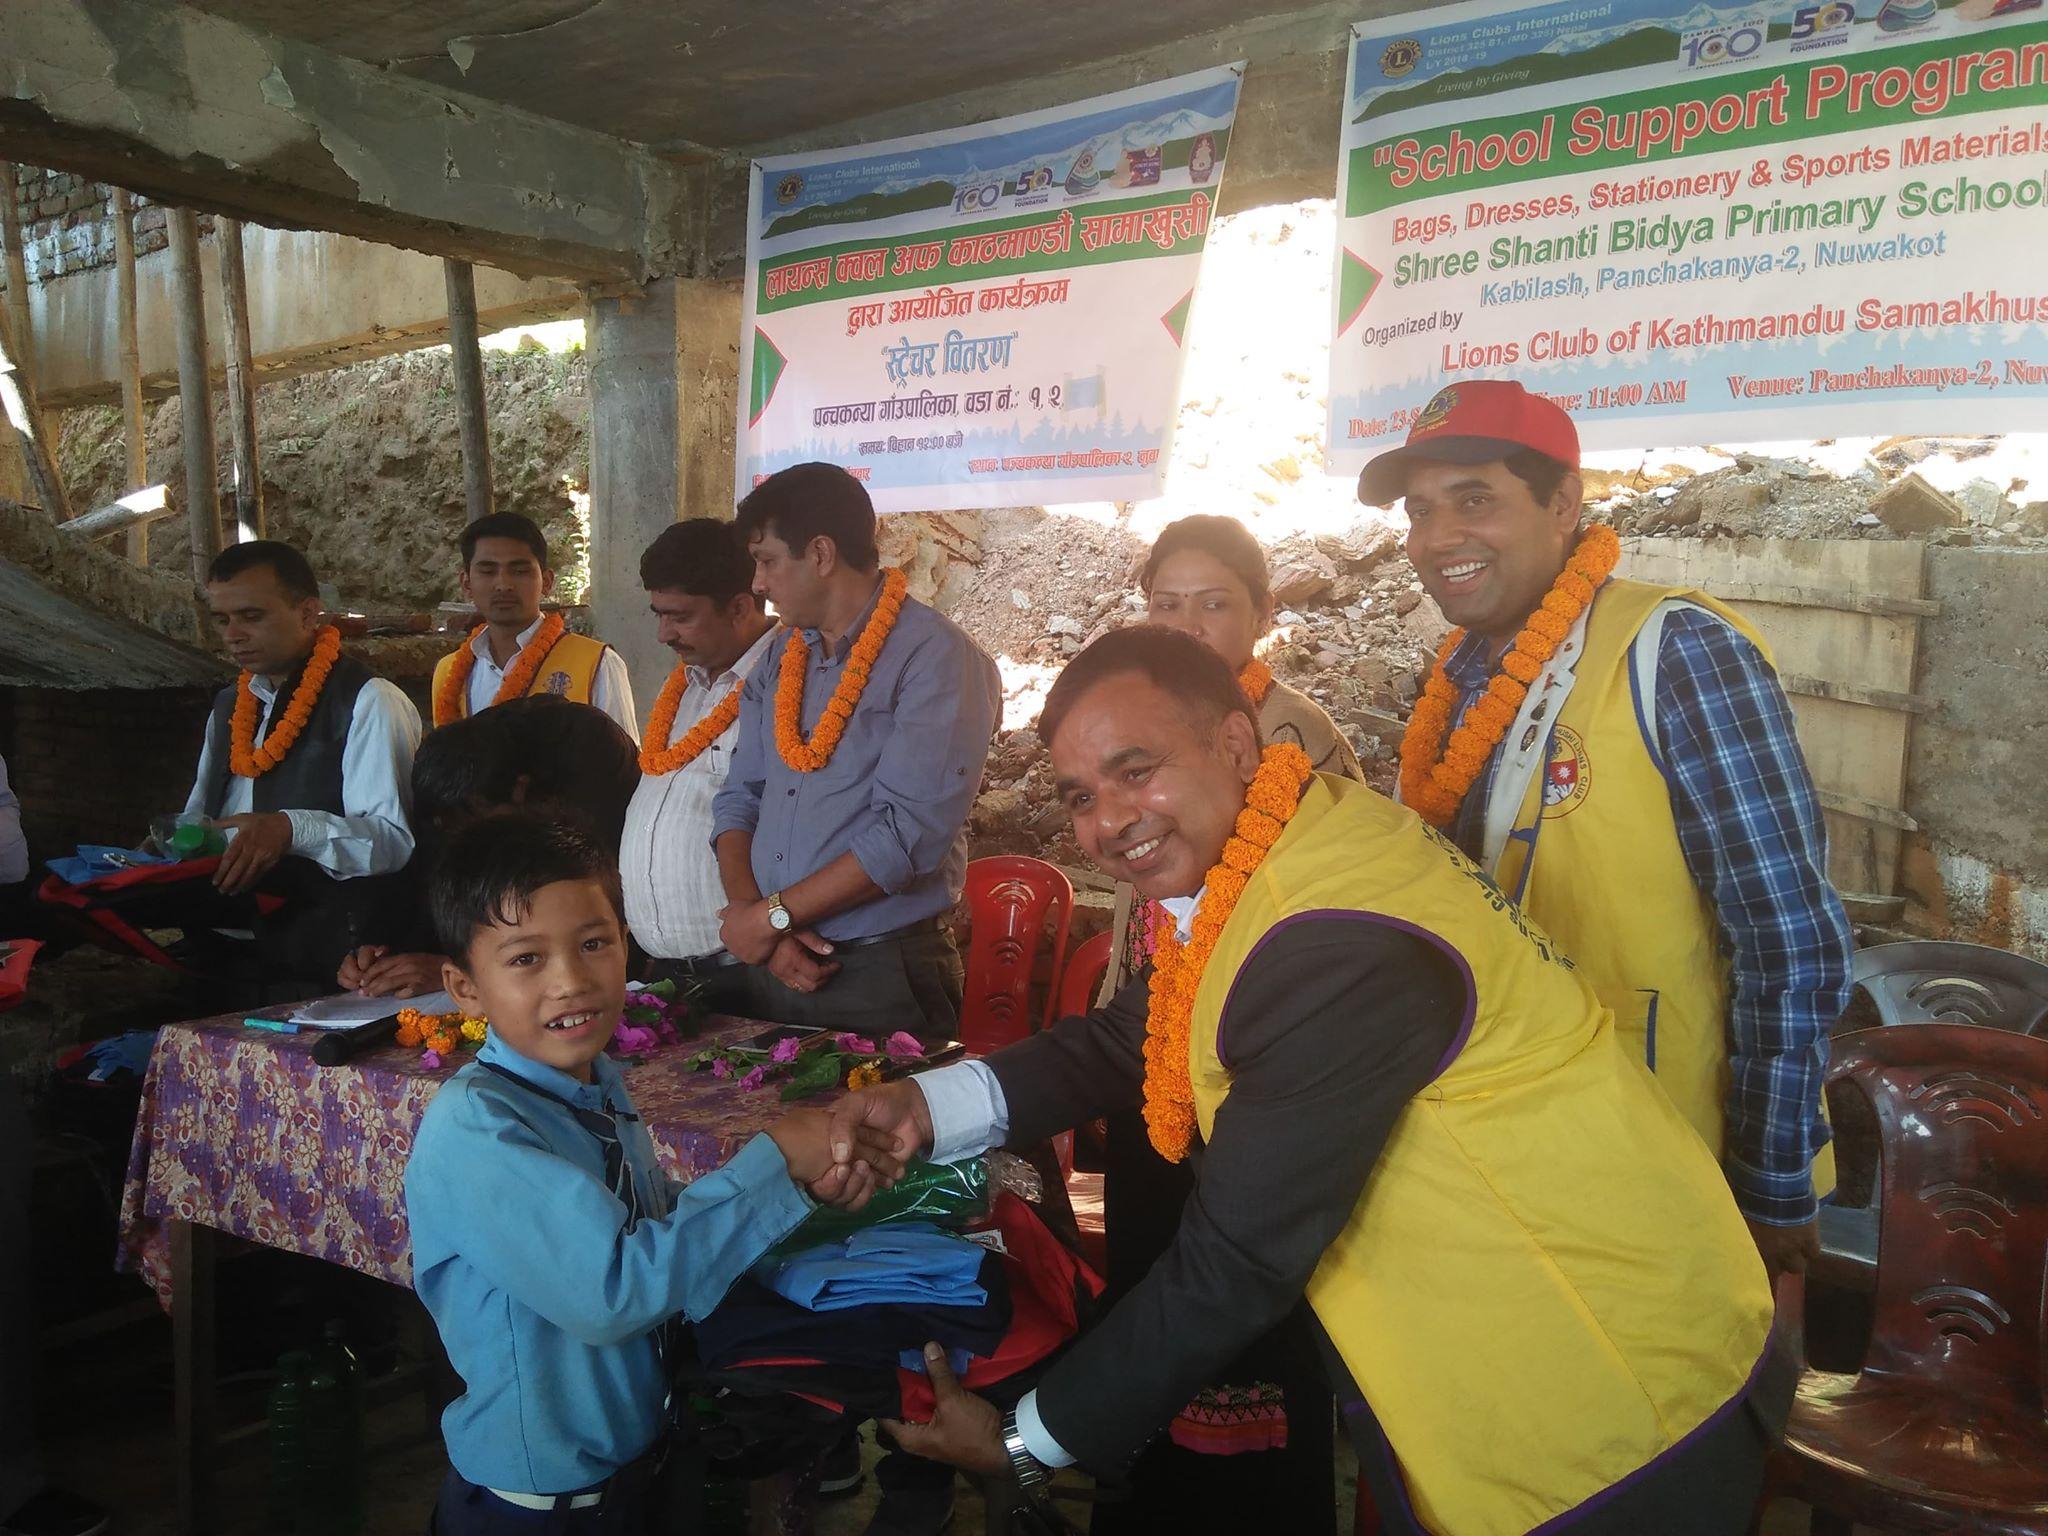 lions club education materials distribution kabilash nuwakot